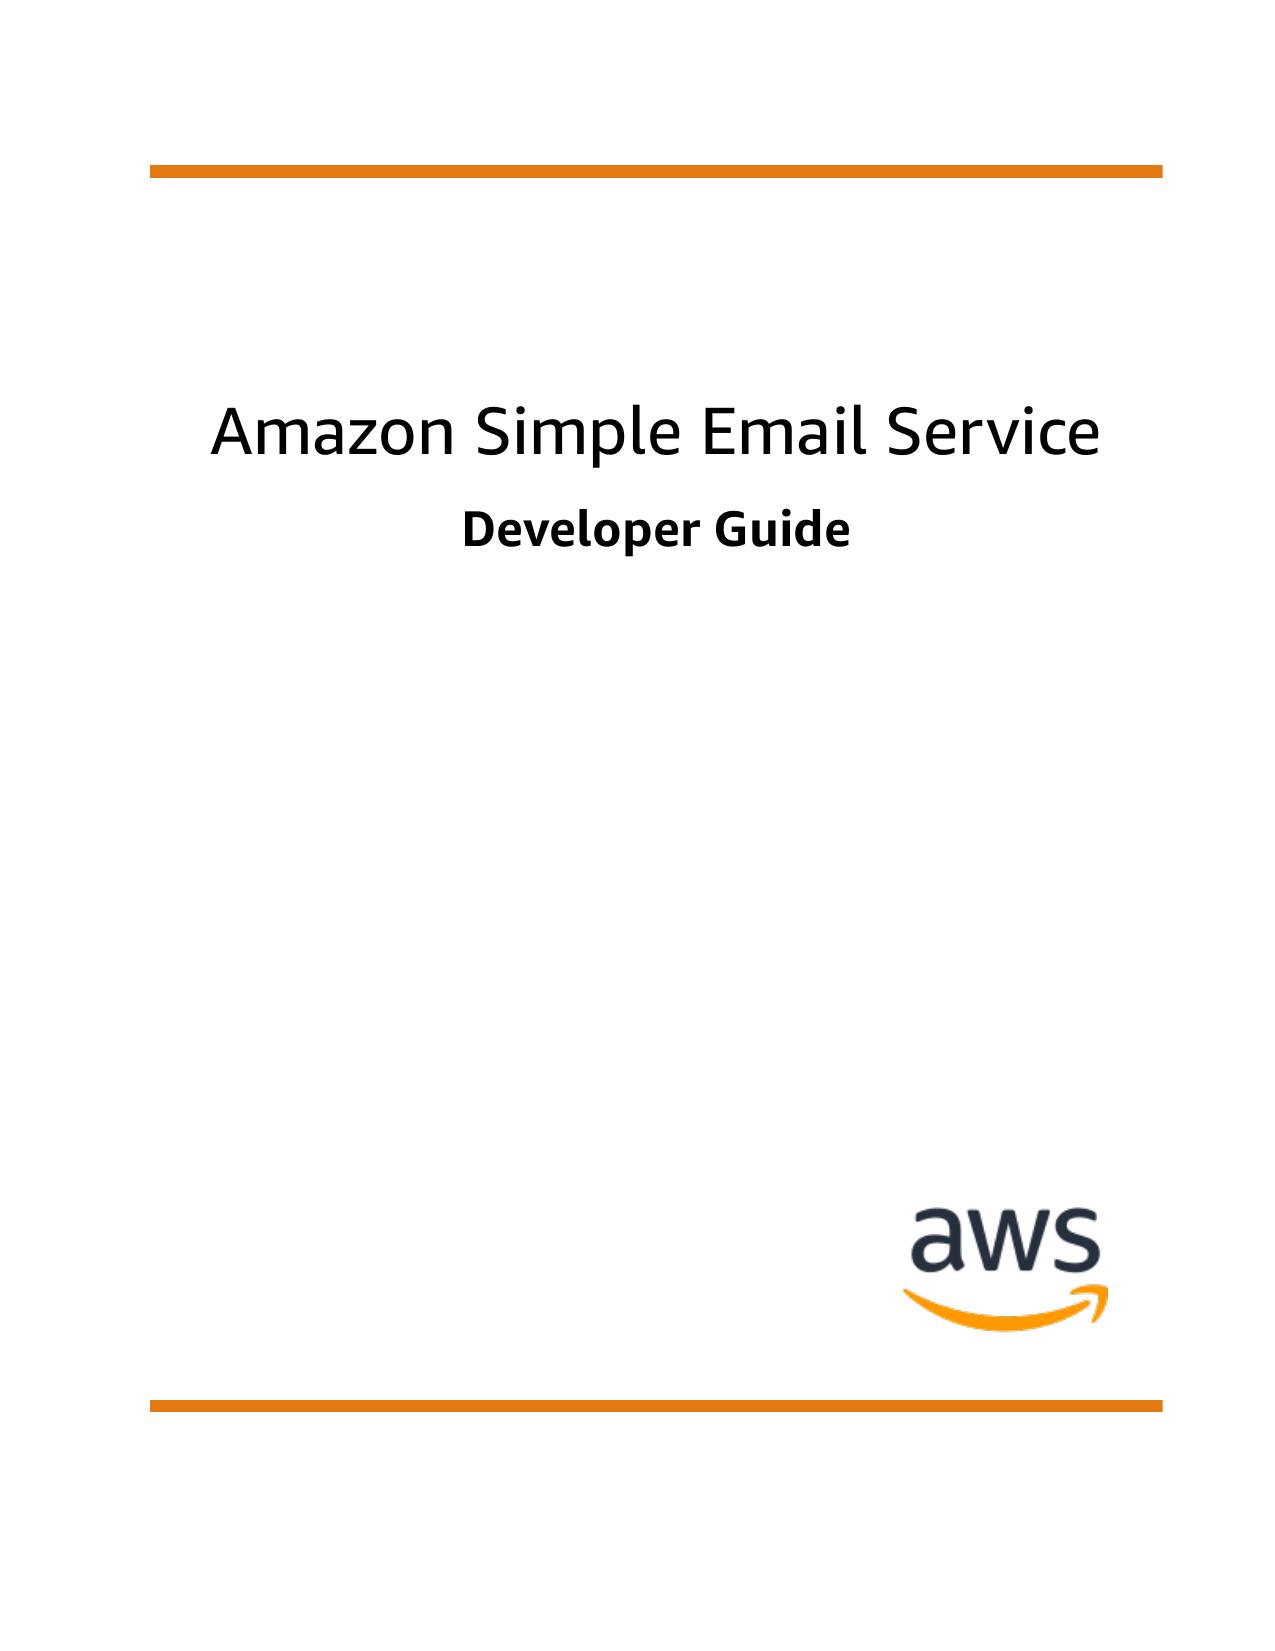 Amazon Simple Email Service - Developer Guide | manualzz com